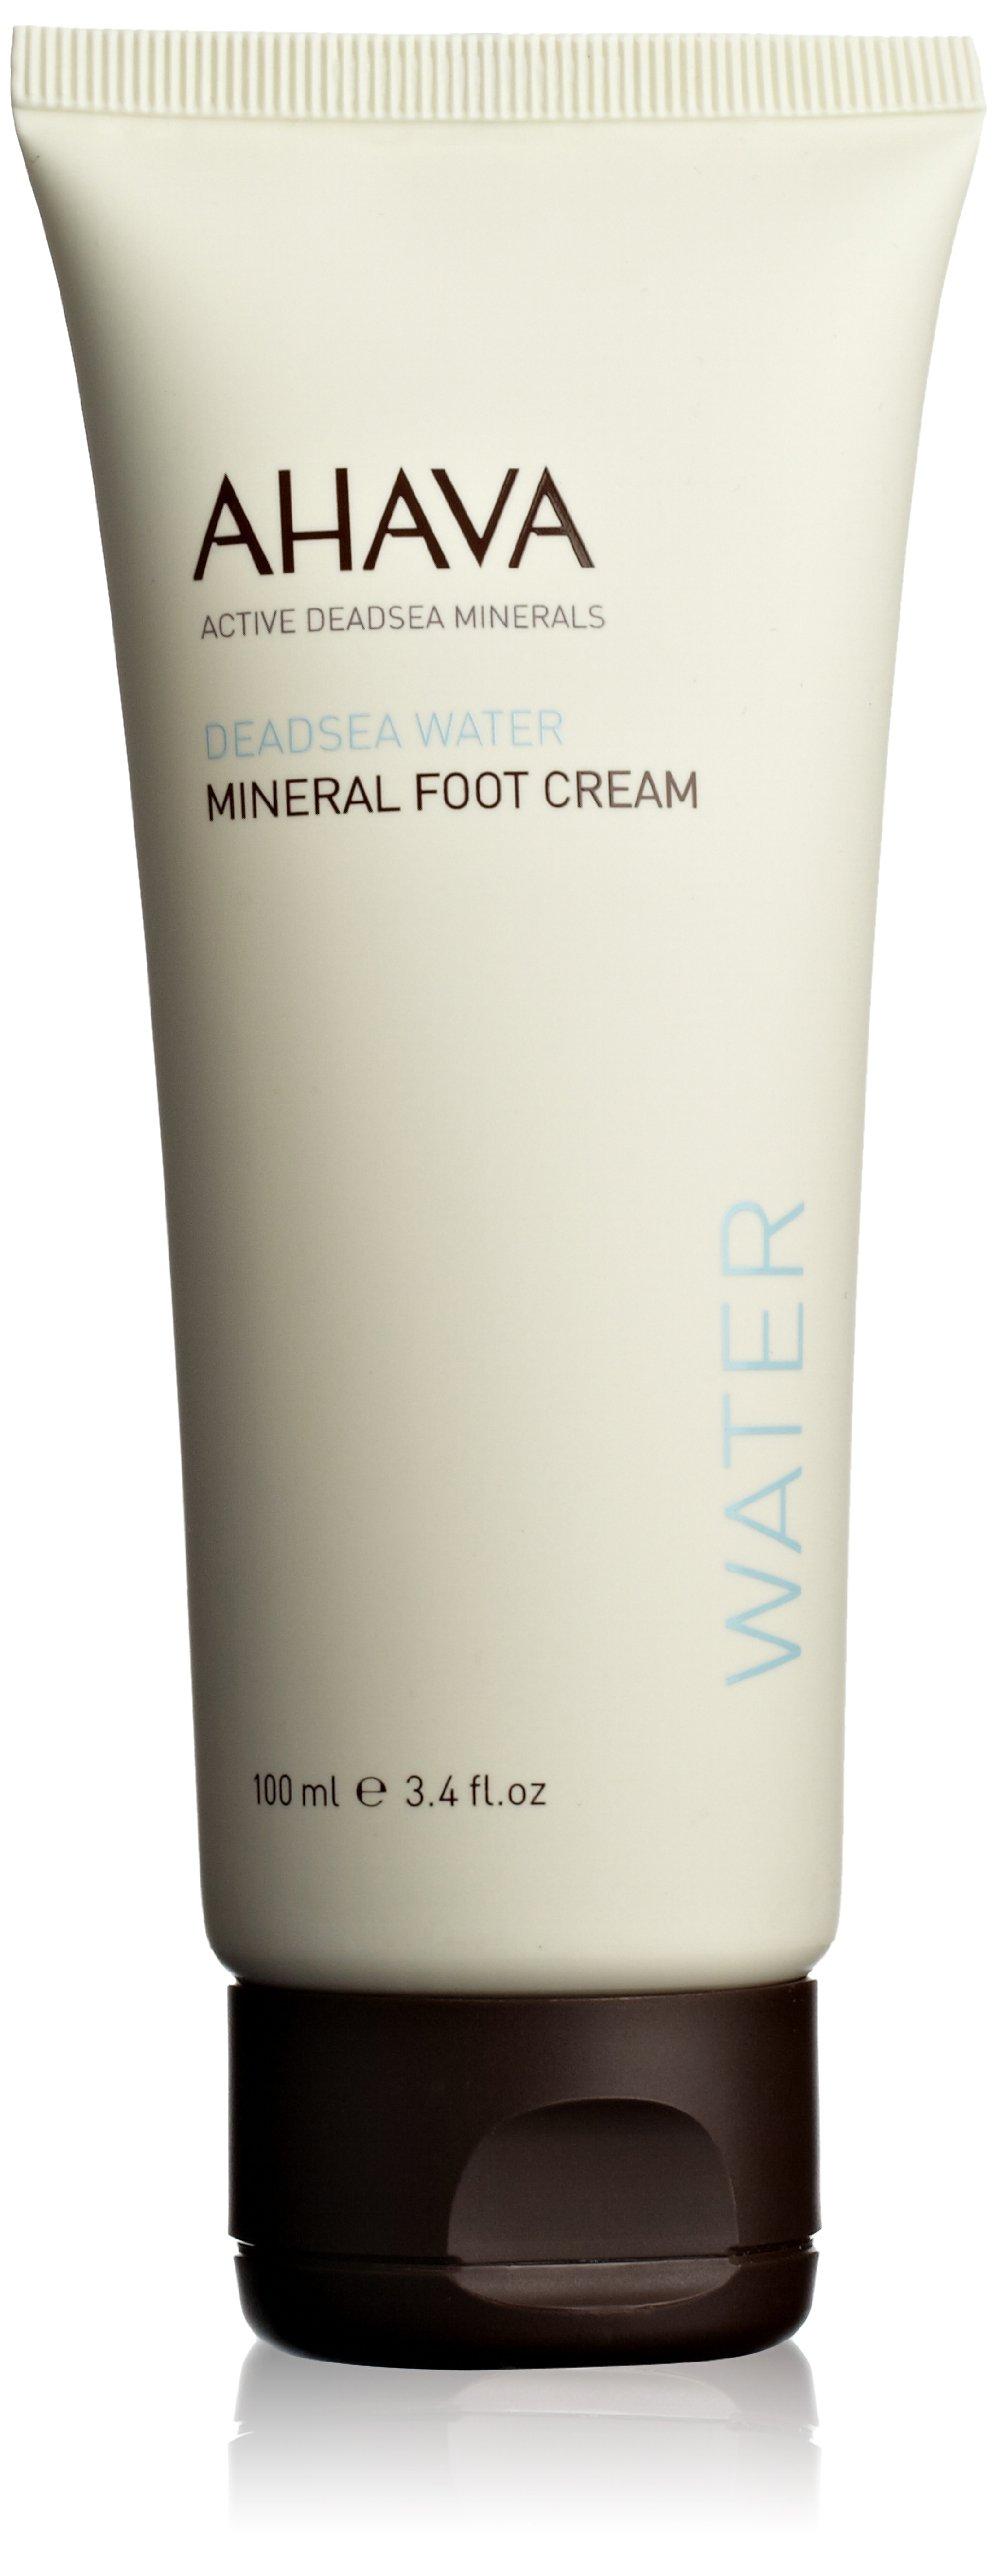 AHAVA Mineral Foot Cream